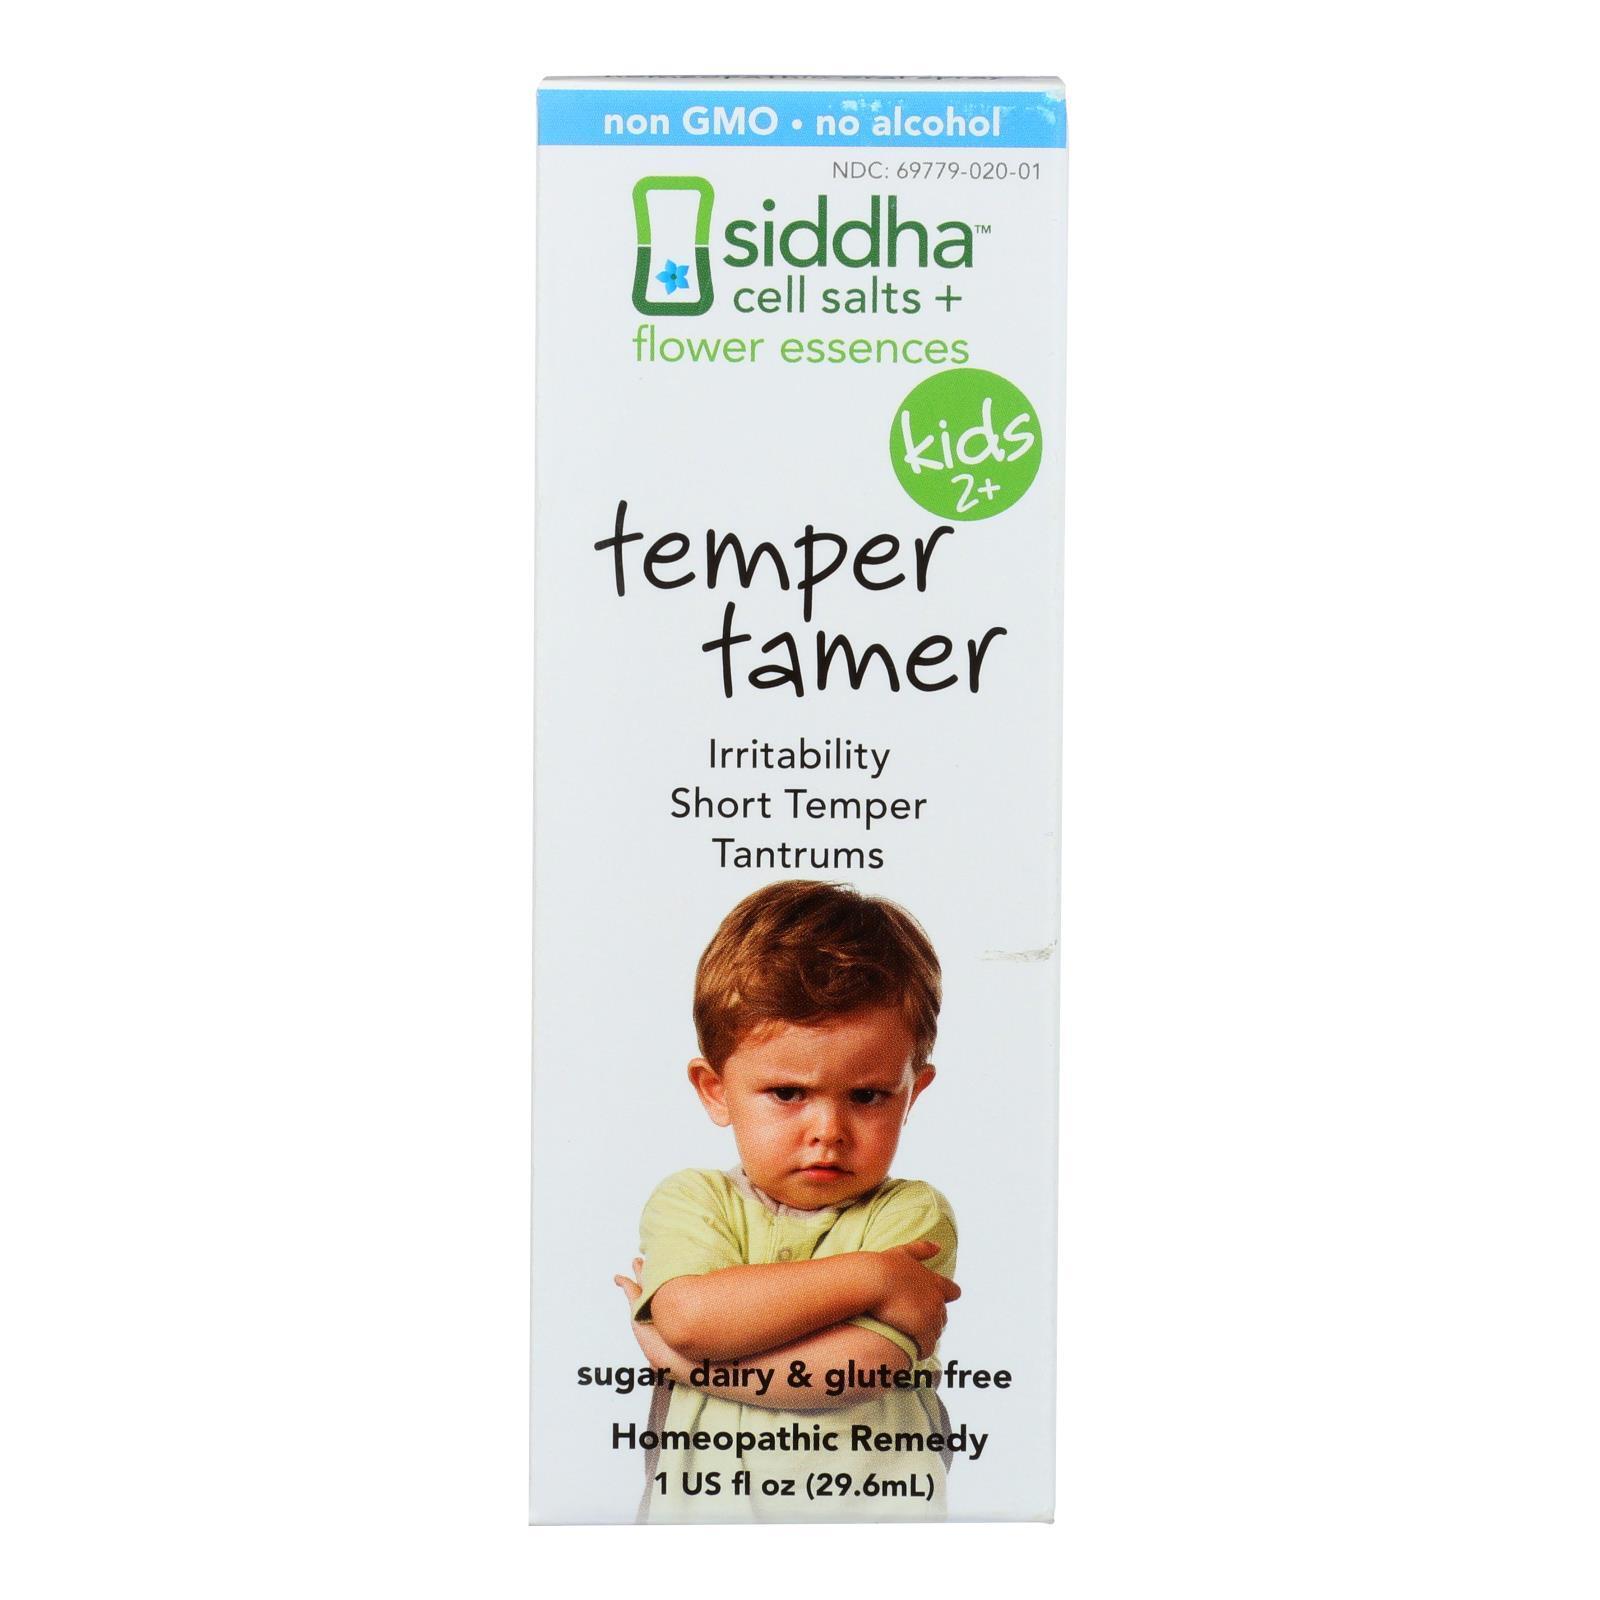 Siddha Flower Essences Temper Tamer - Kids - Age Two Plus - 1 fl oz